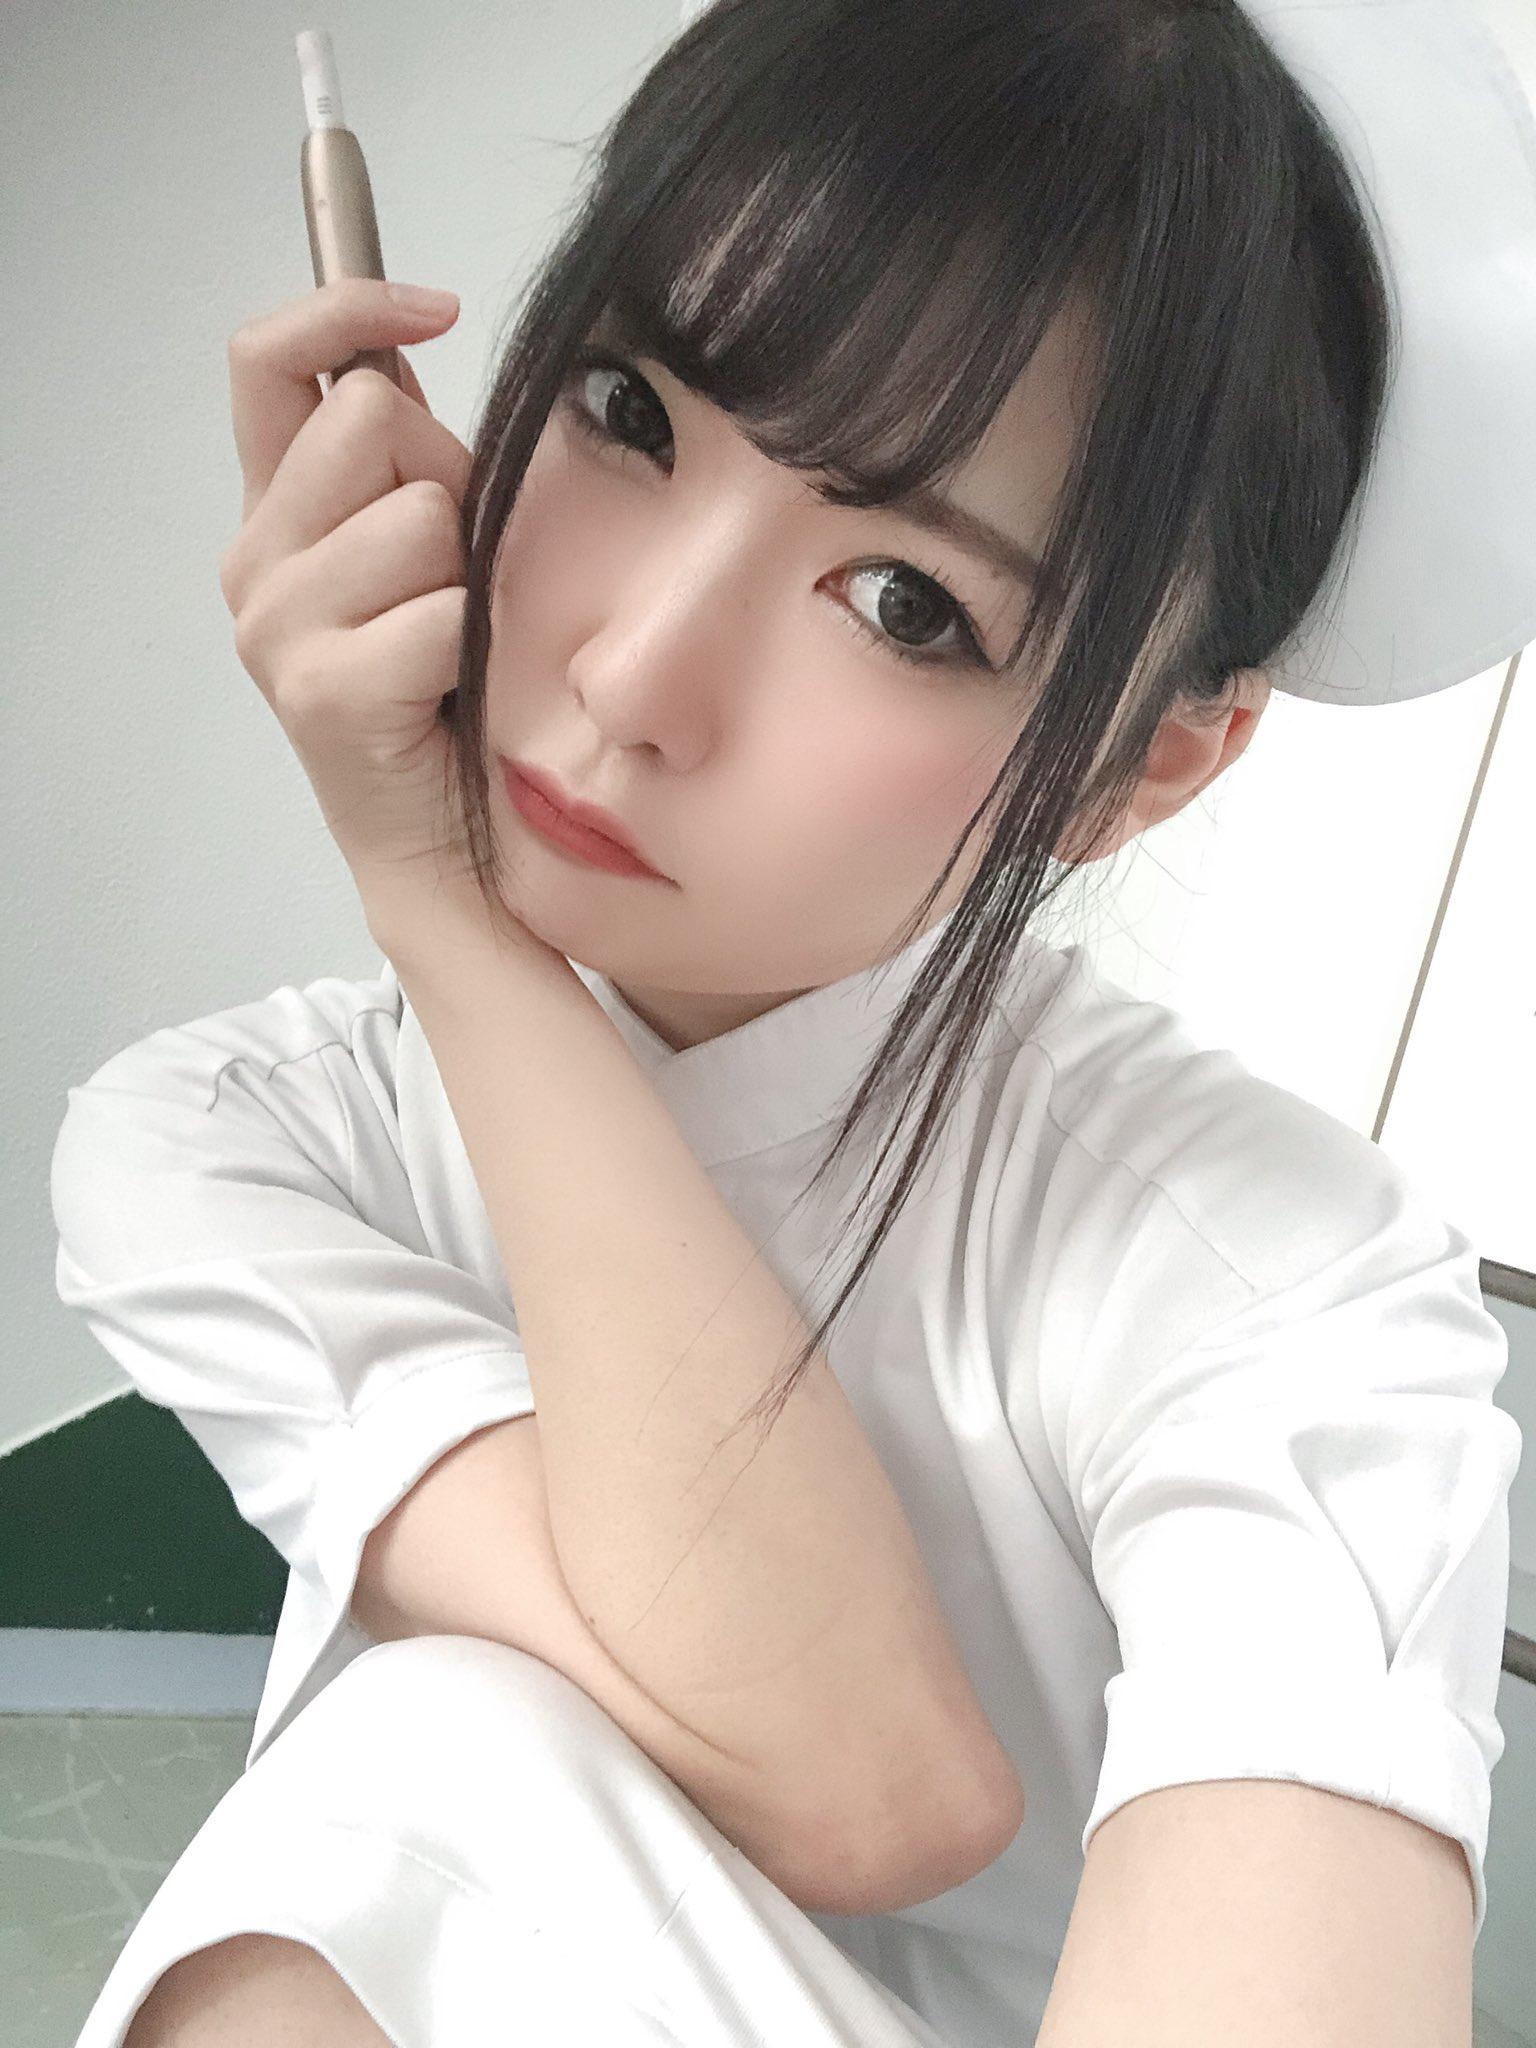 Suzuka Kurumi 涼花くるみ 21 times a week - ScanLover 2.0 - Discuss JAV & Asian